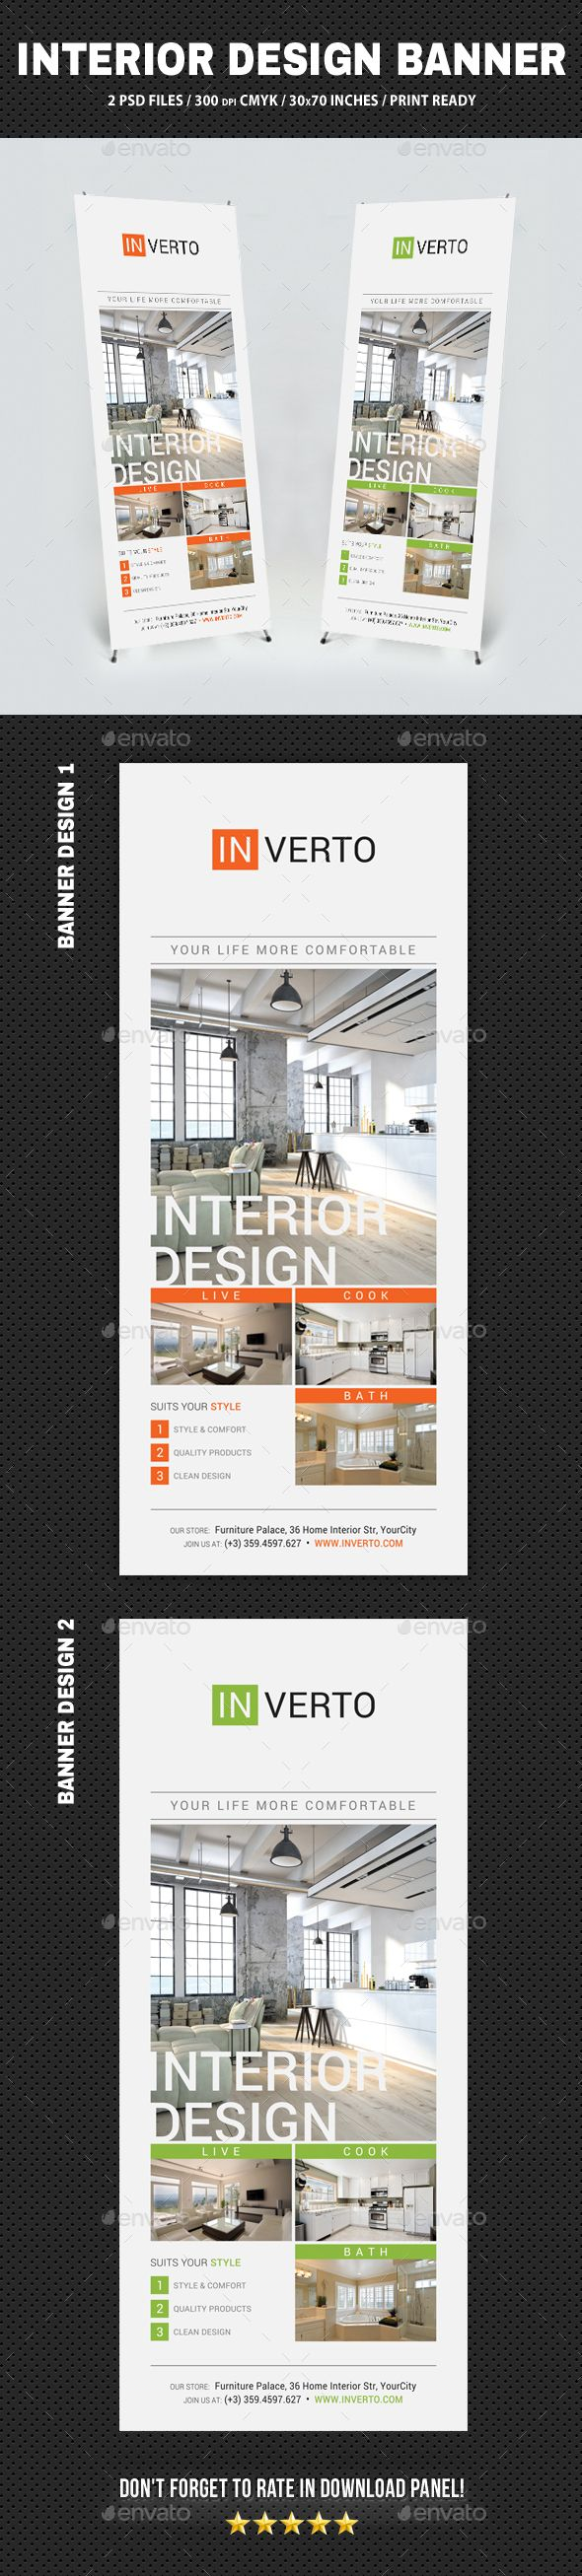 Interior Design Banner V2 Banner Design